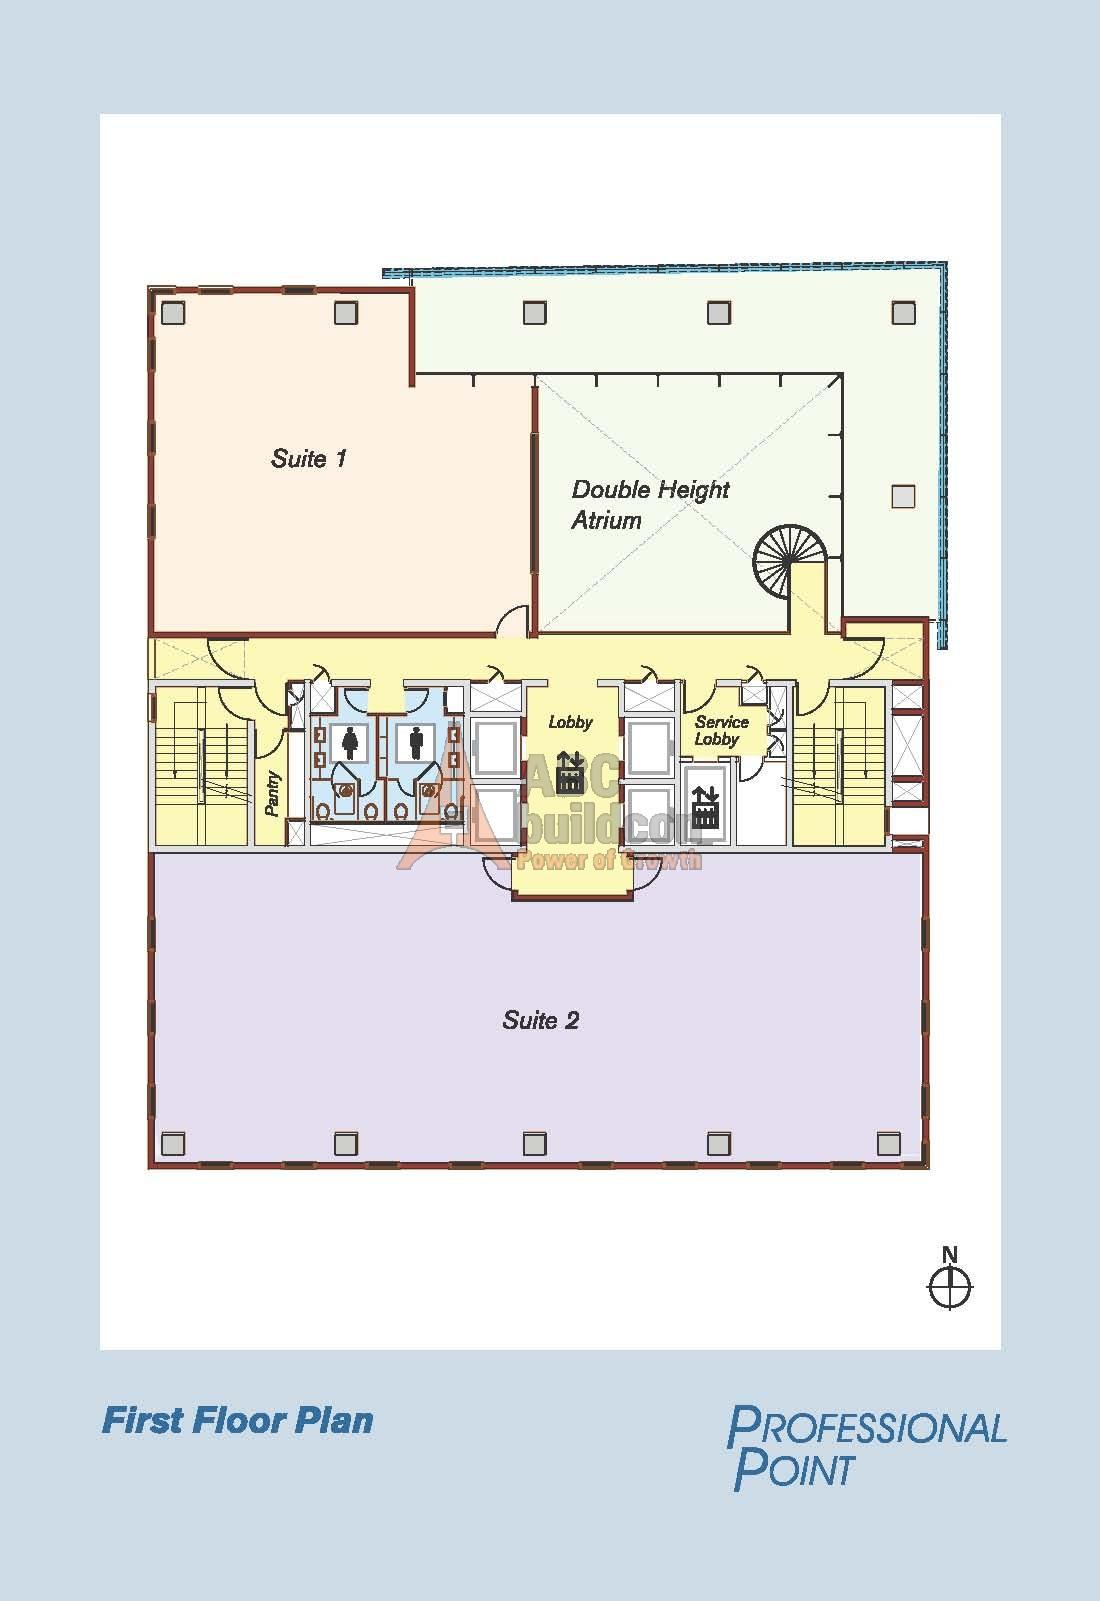 Vatika professional point sec 66 golf course ext road for Landcraft homes floor plans